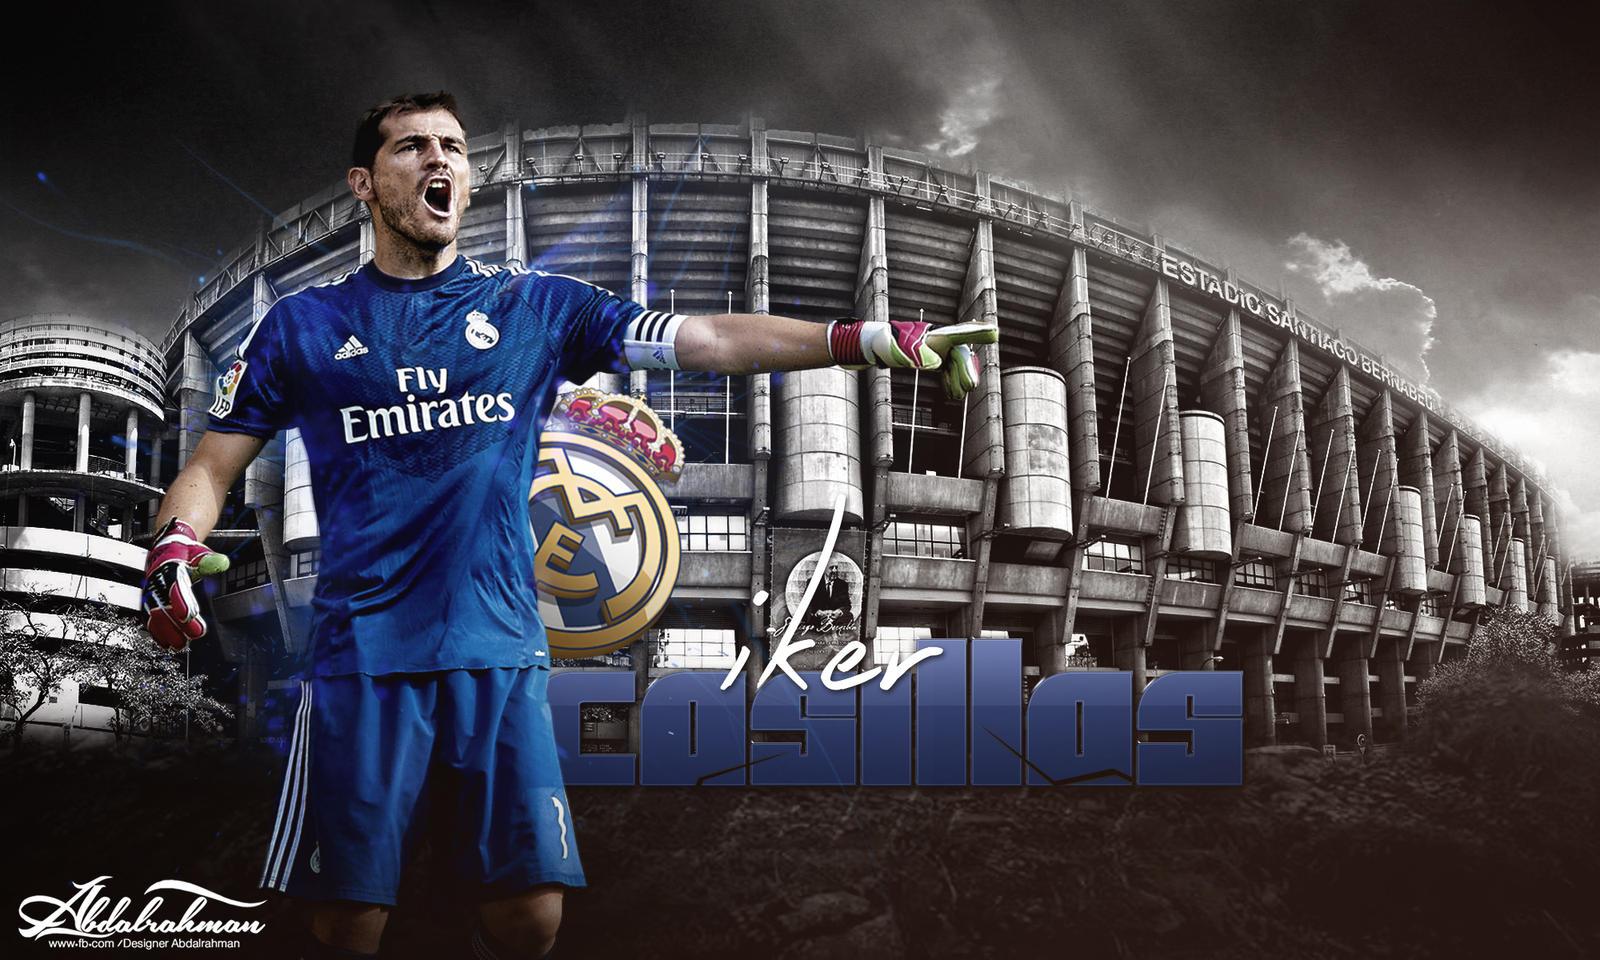 Wallpaper Iker Casillas 2014 By Designer Abdalrahman